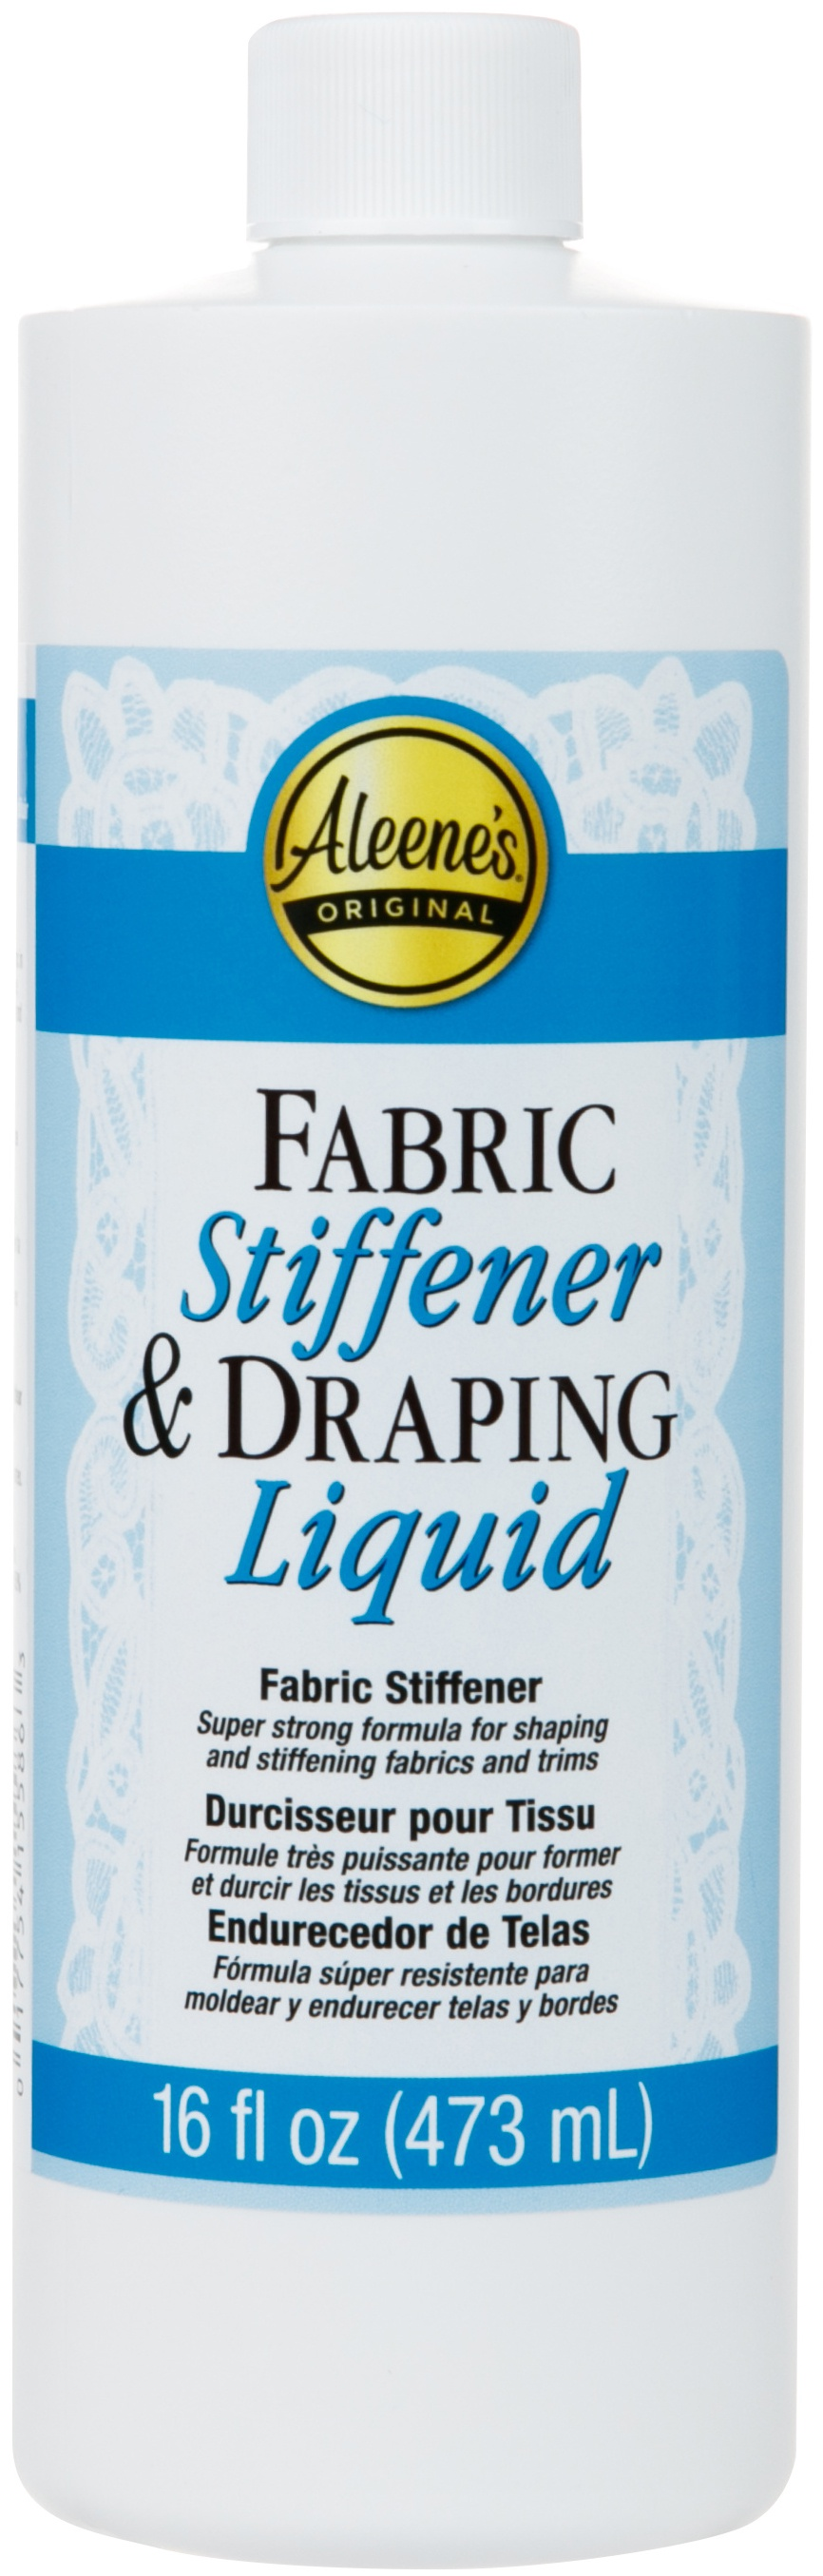 Aleene's Fabric Stiffener & Draping Liquid-16oz